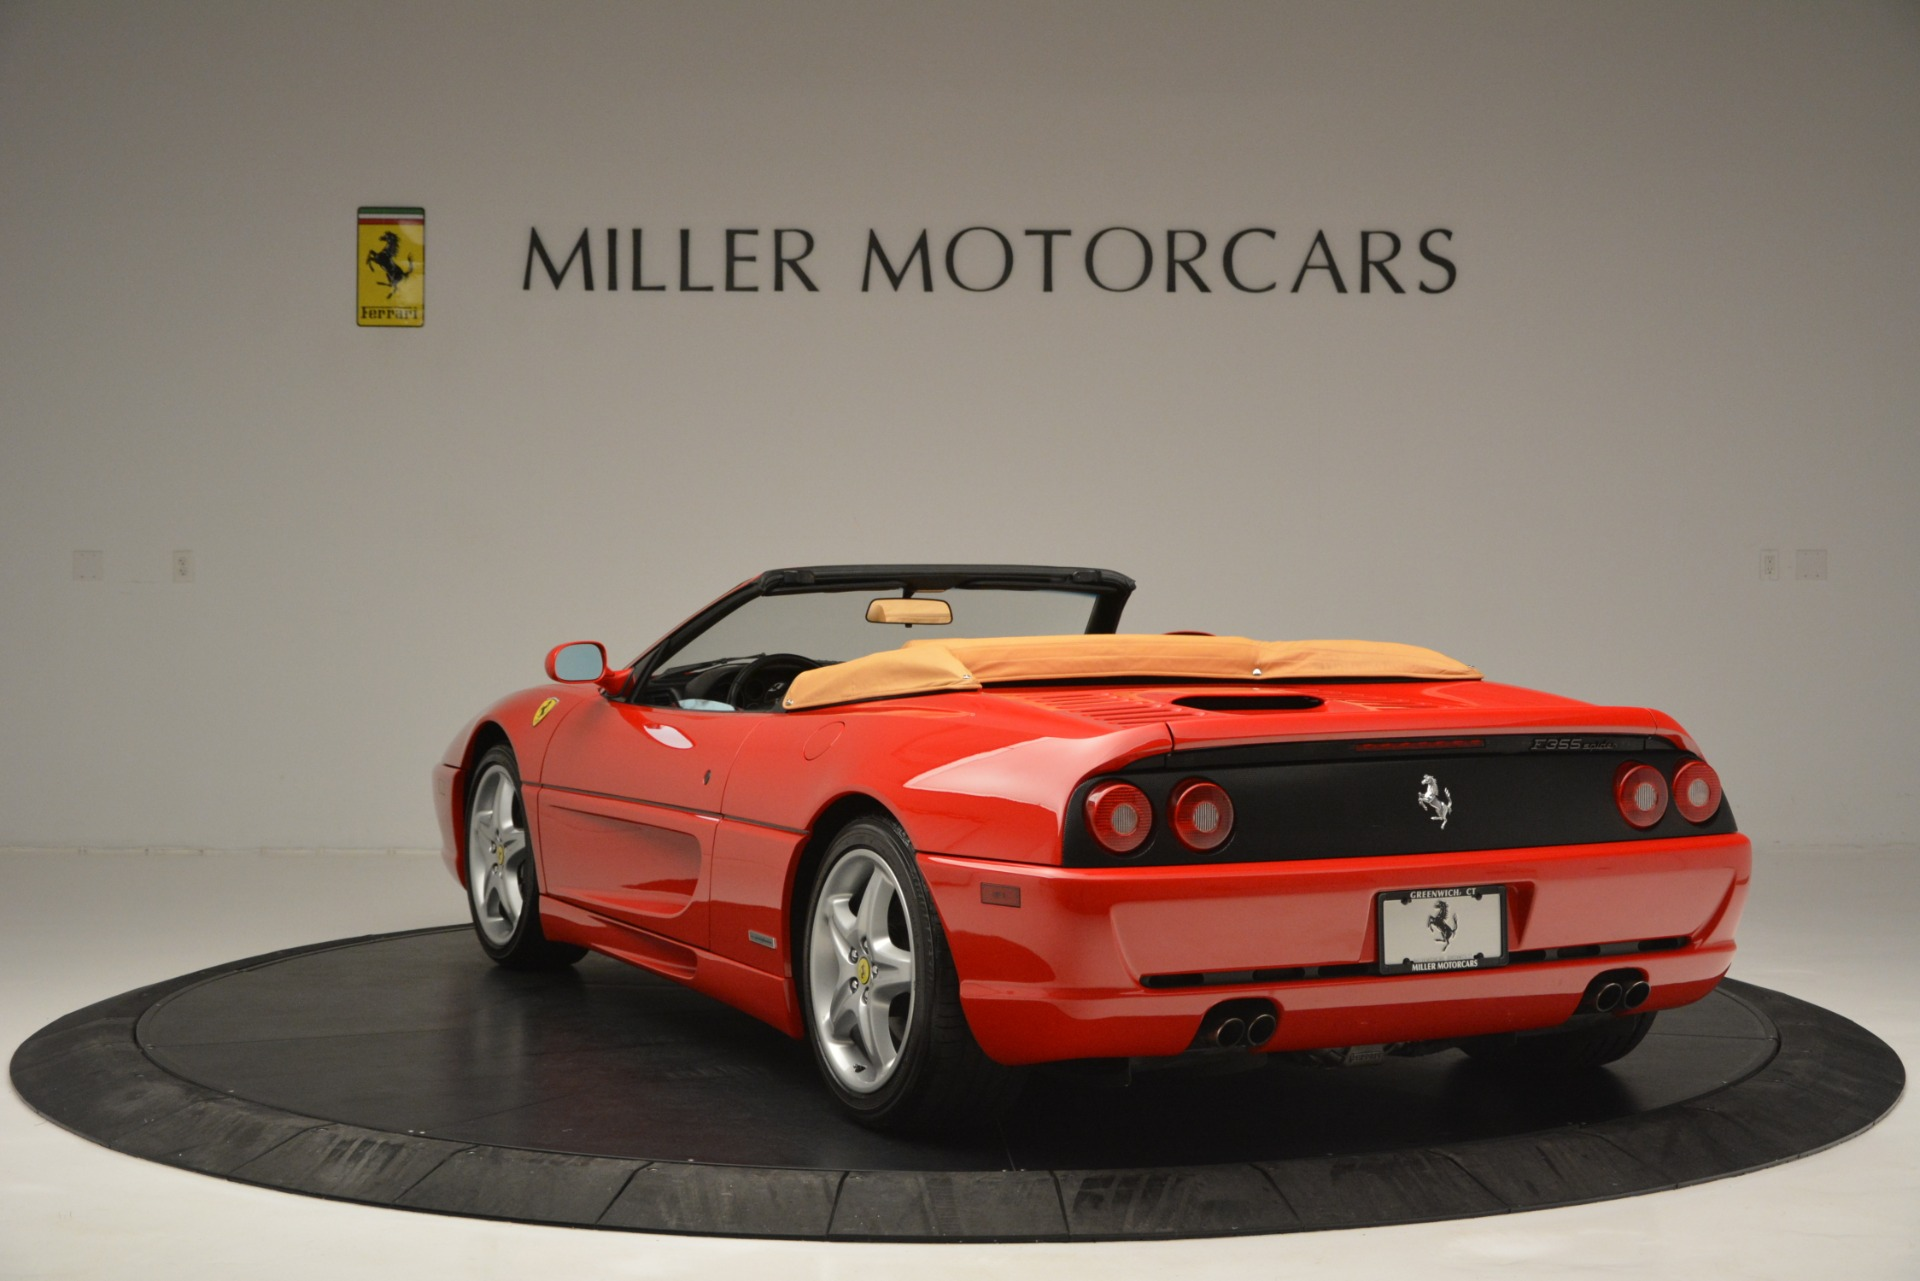 Used 1997 Ferrari 355 Spider 6-Speed Manual For Sale In Westport, CT 2735_p5